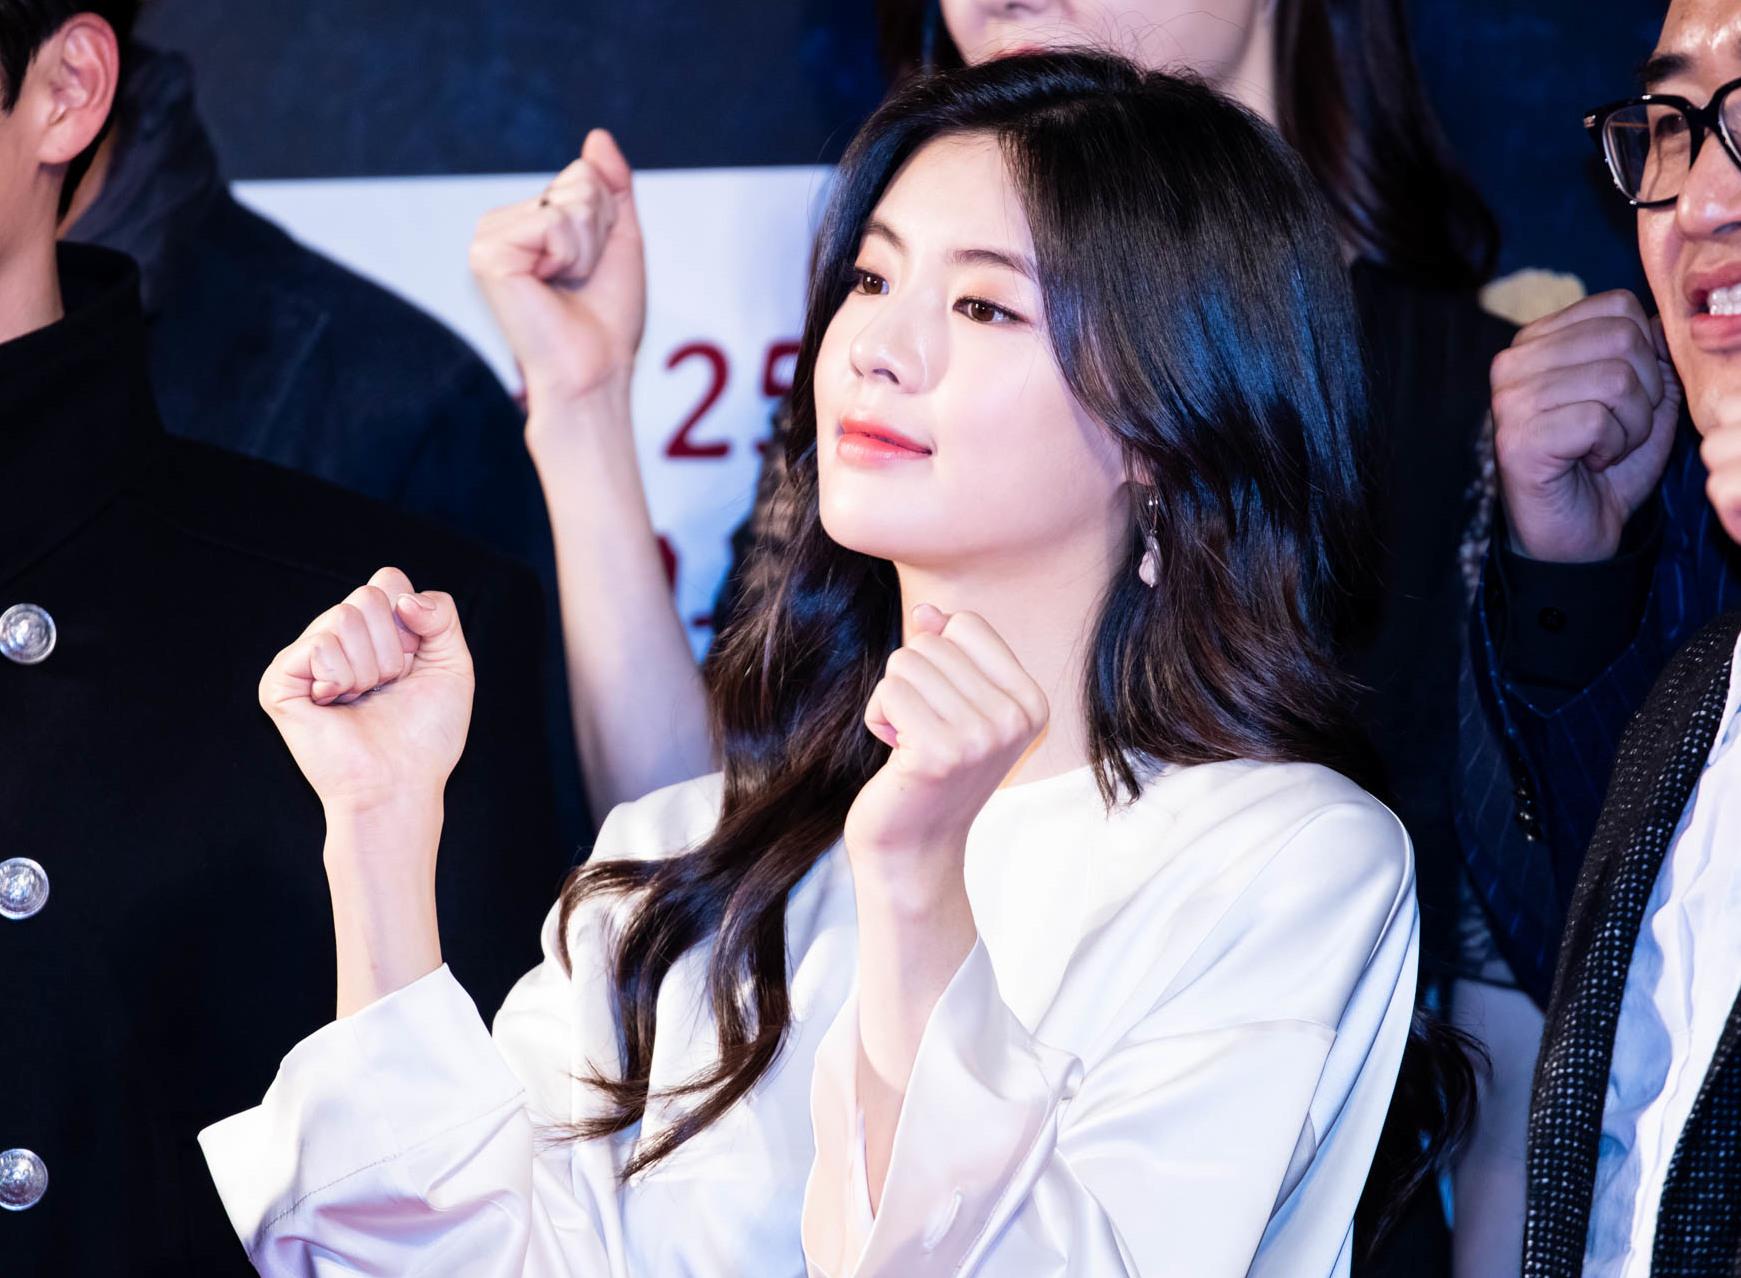 lee kwang soo dating 2020